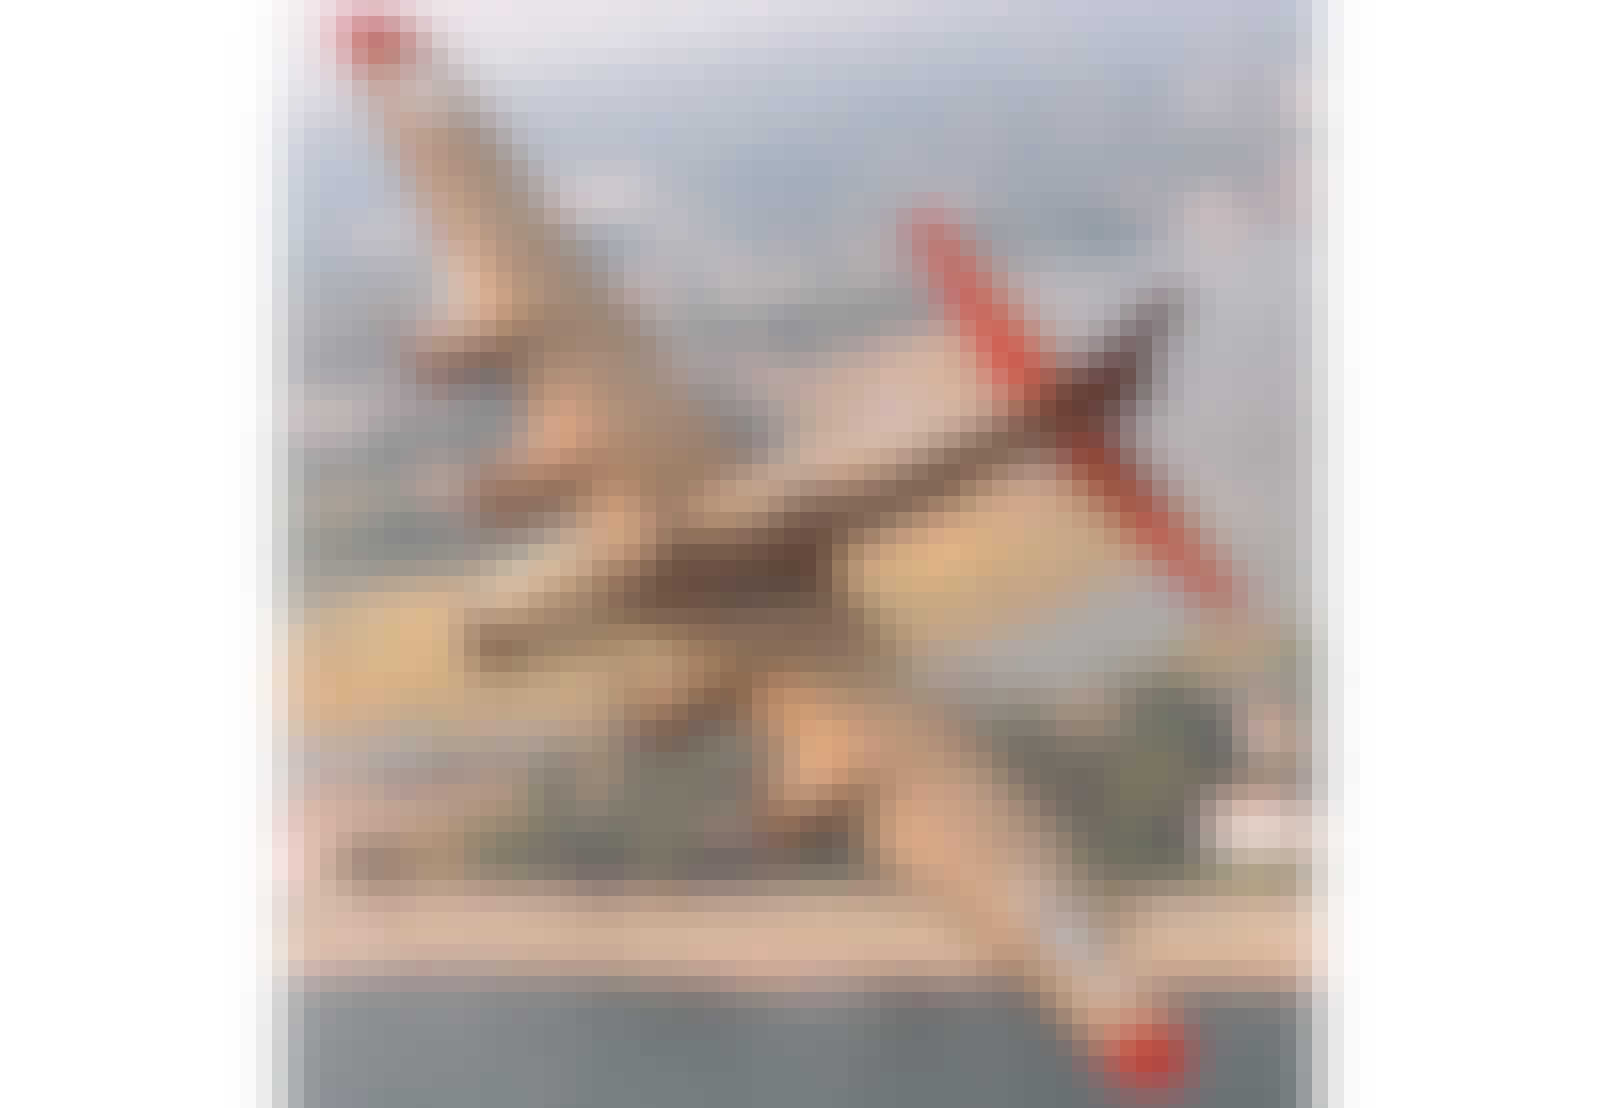 b-17 show